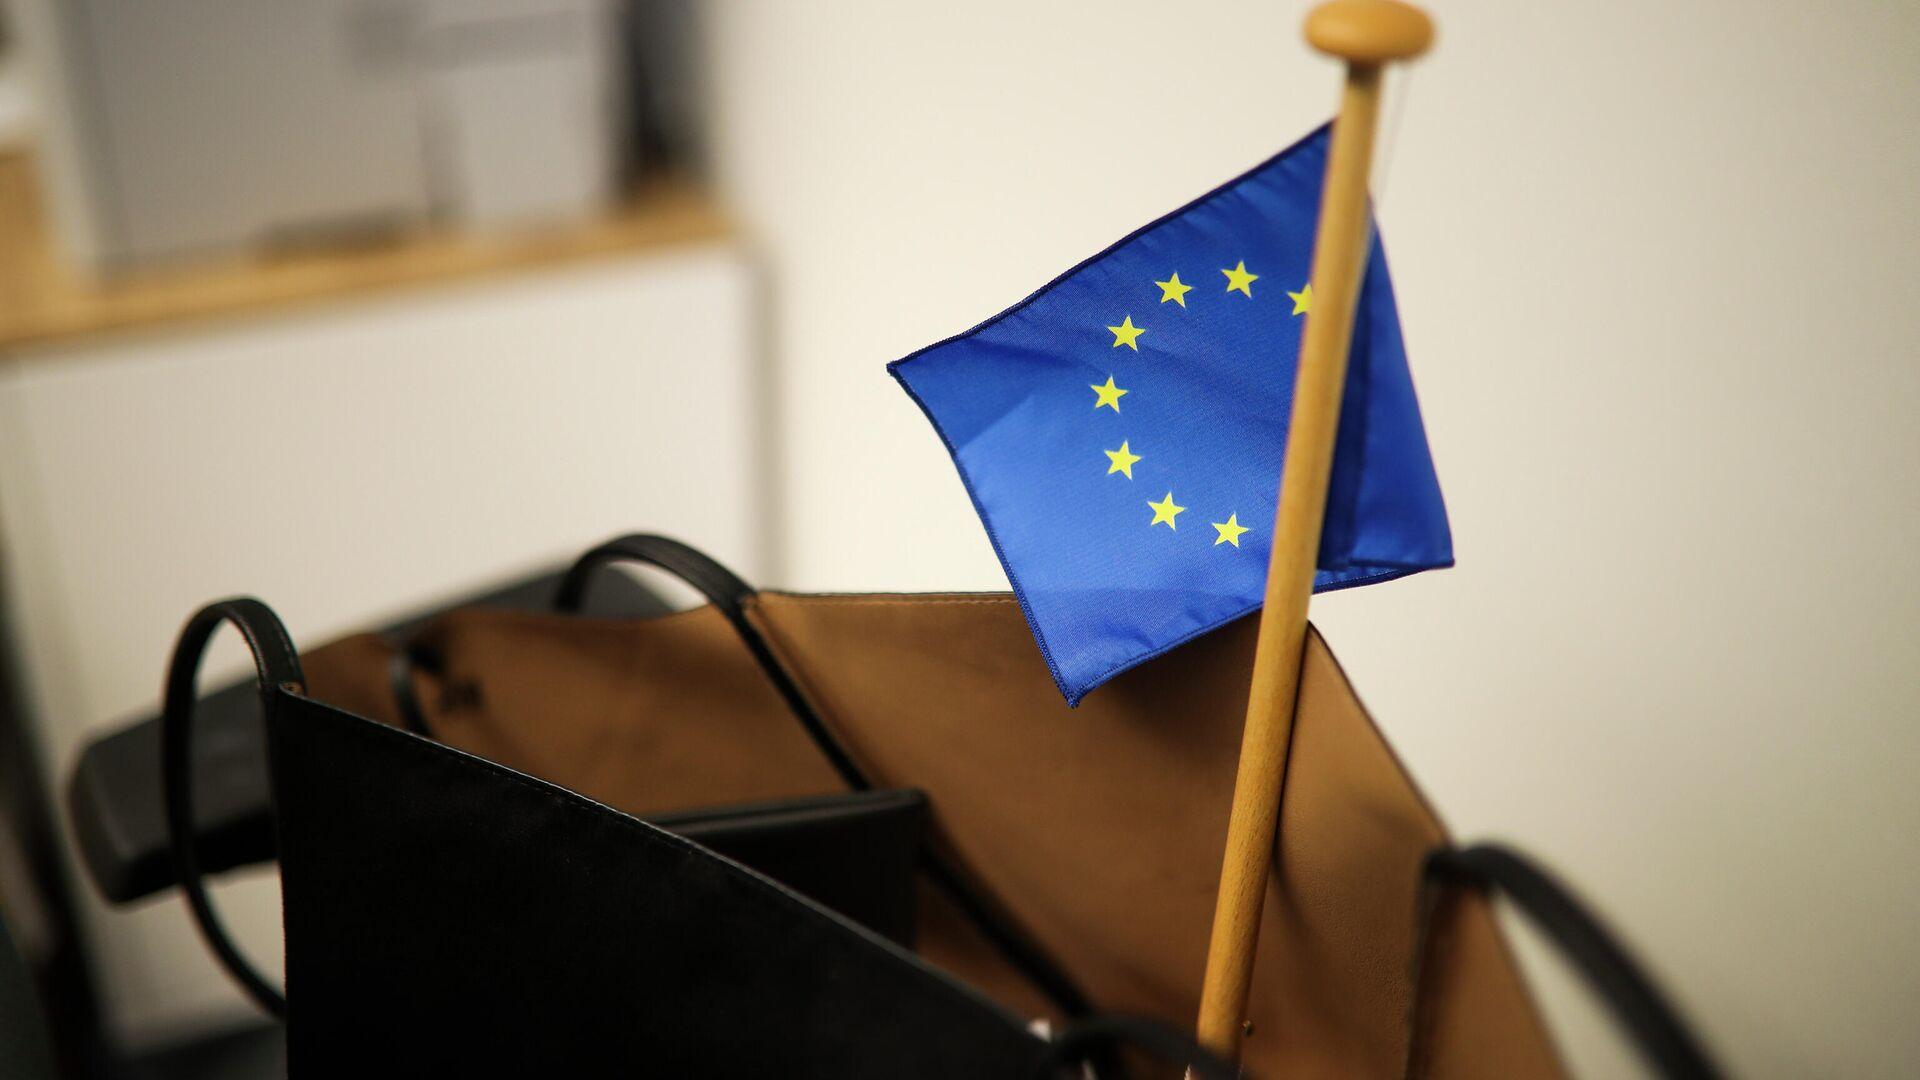 Сумка с флажком ЕС в здании Европейского парламента в брюсселе - РИА Новости, 1920, 21.06.2021